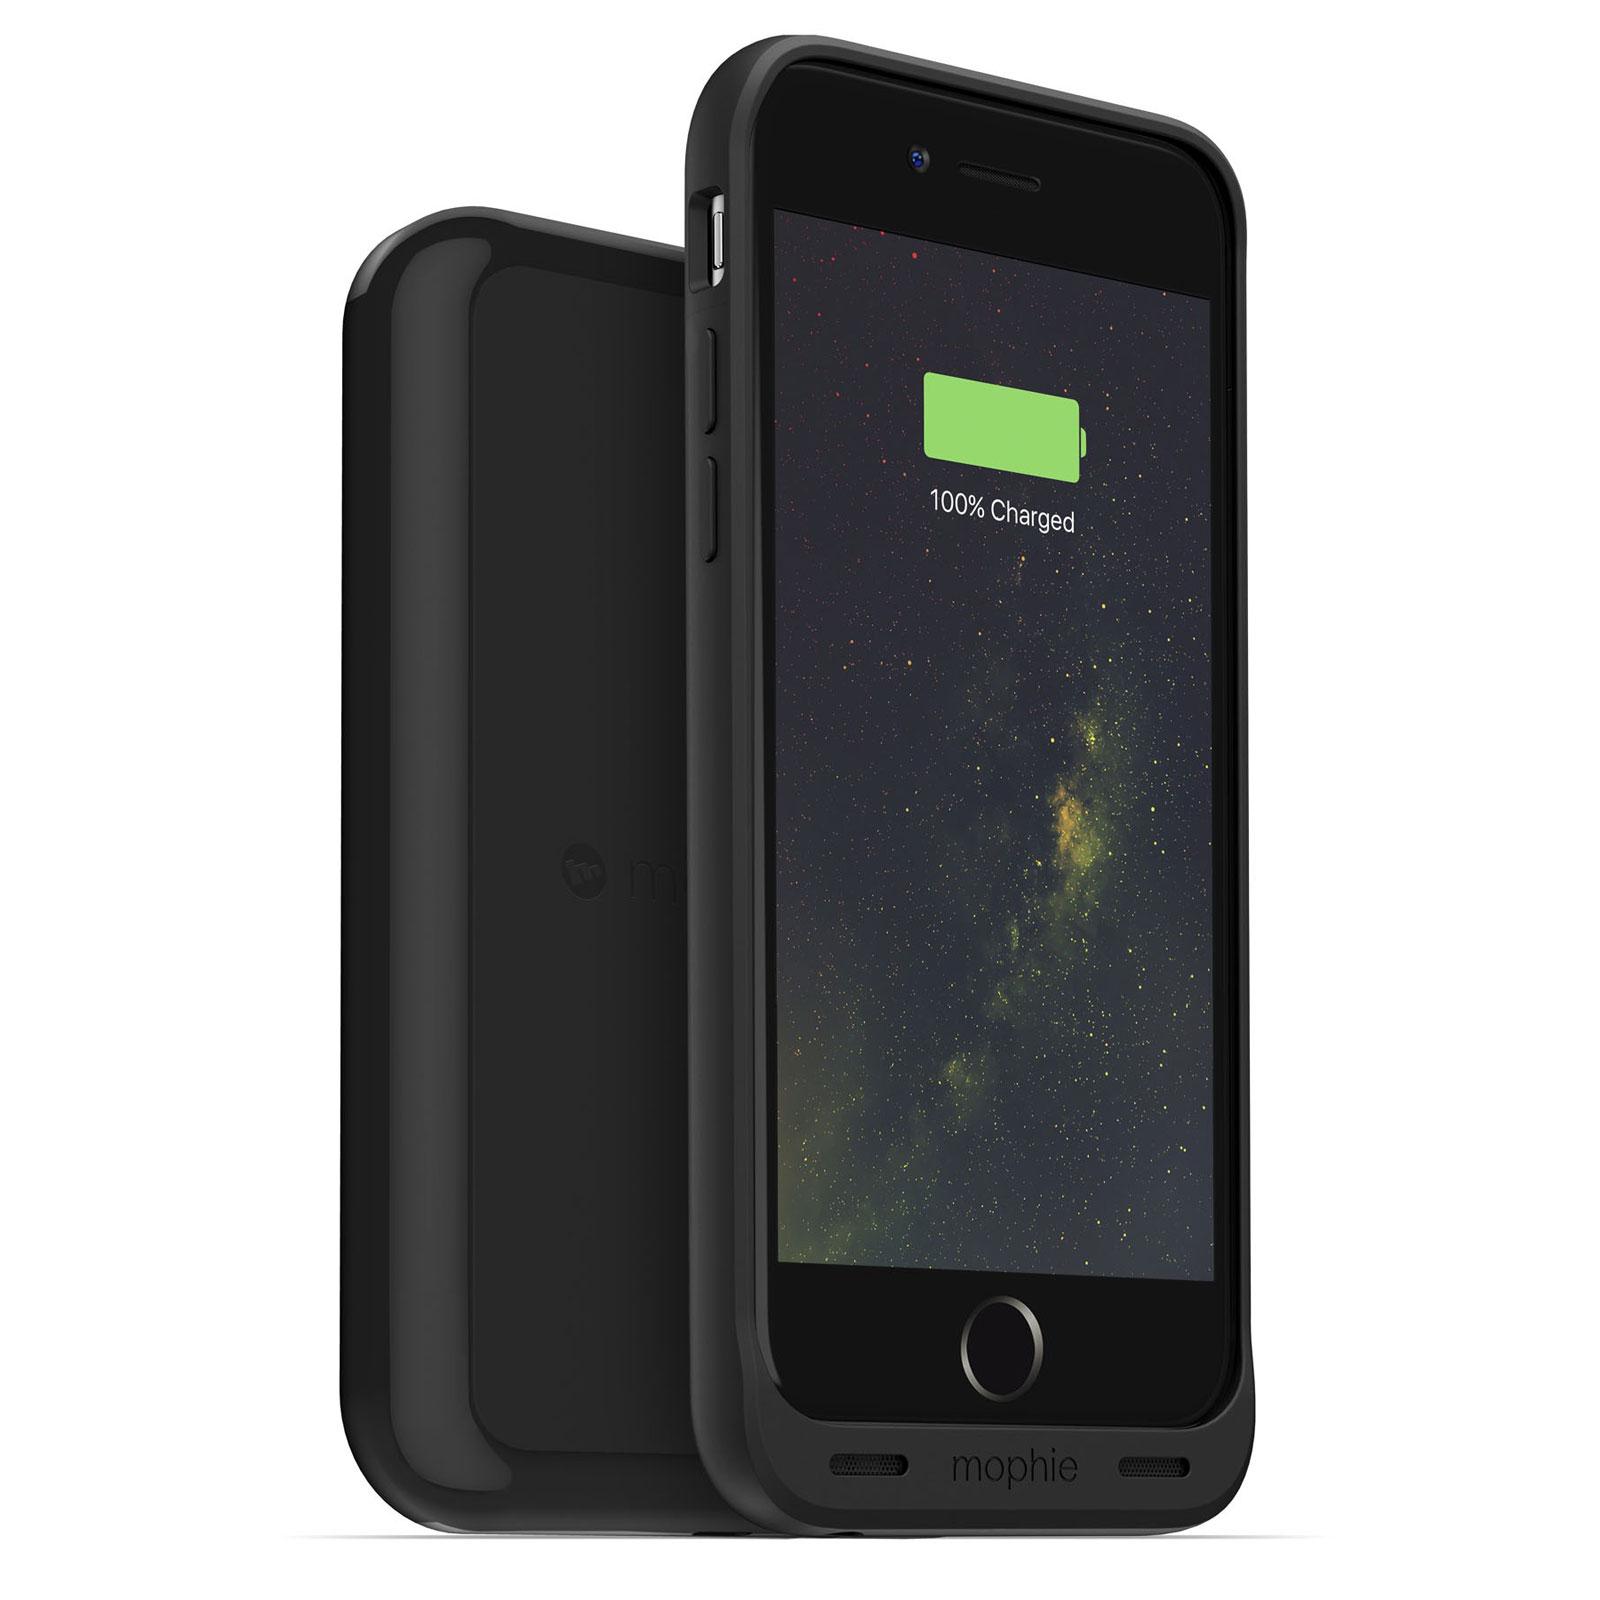 mophie juice pack wireless charging base noir iphone 6 6s etui t l phone mophie sur. Black Bedroom Furniture Sets. Home Design Ideas